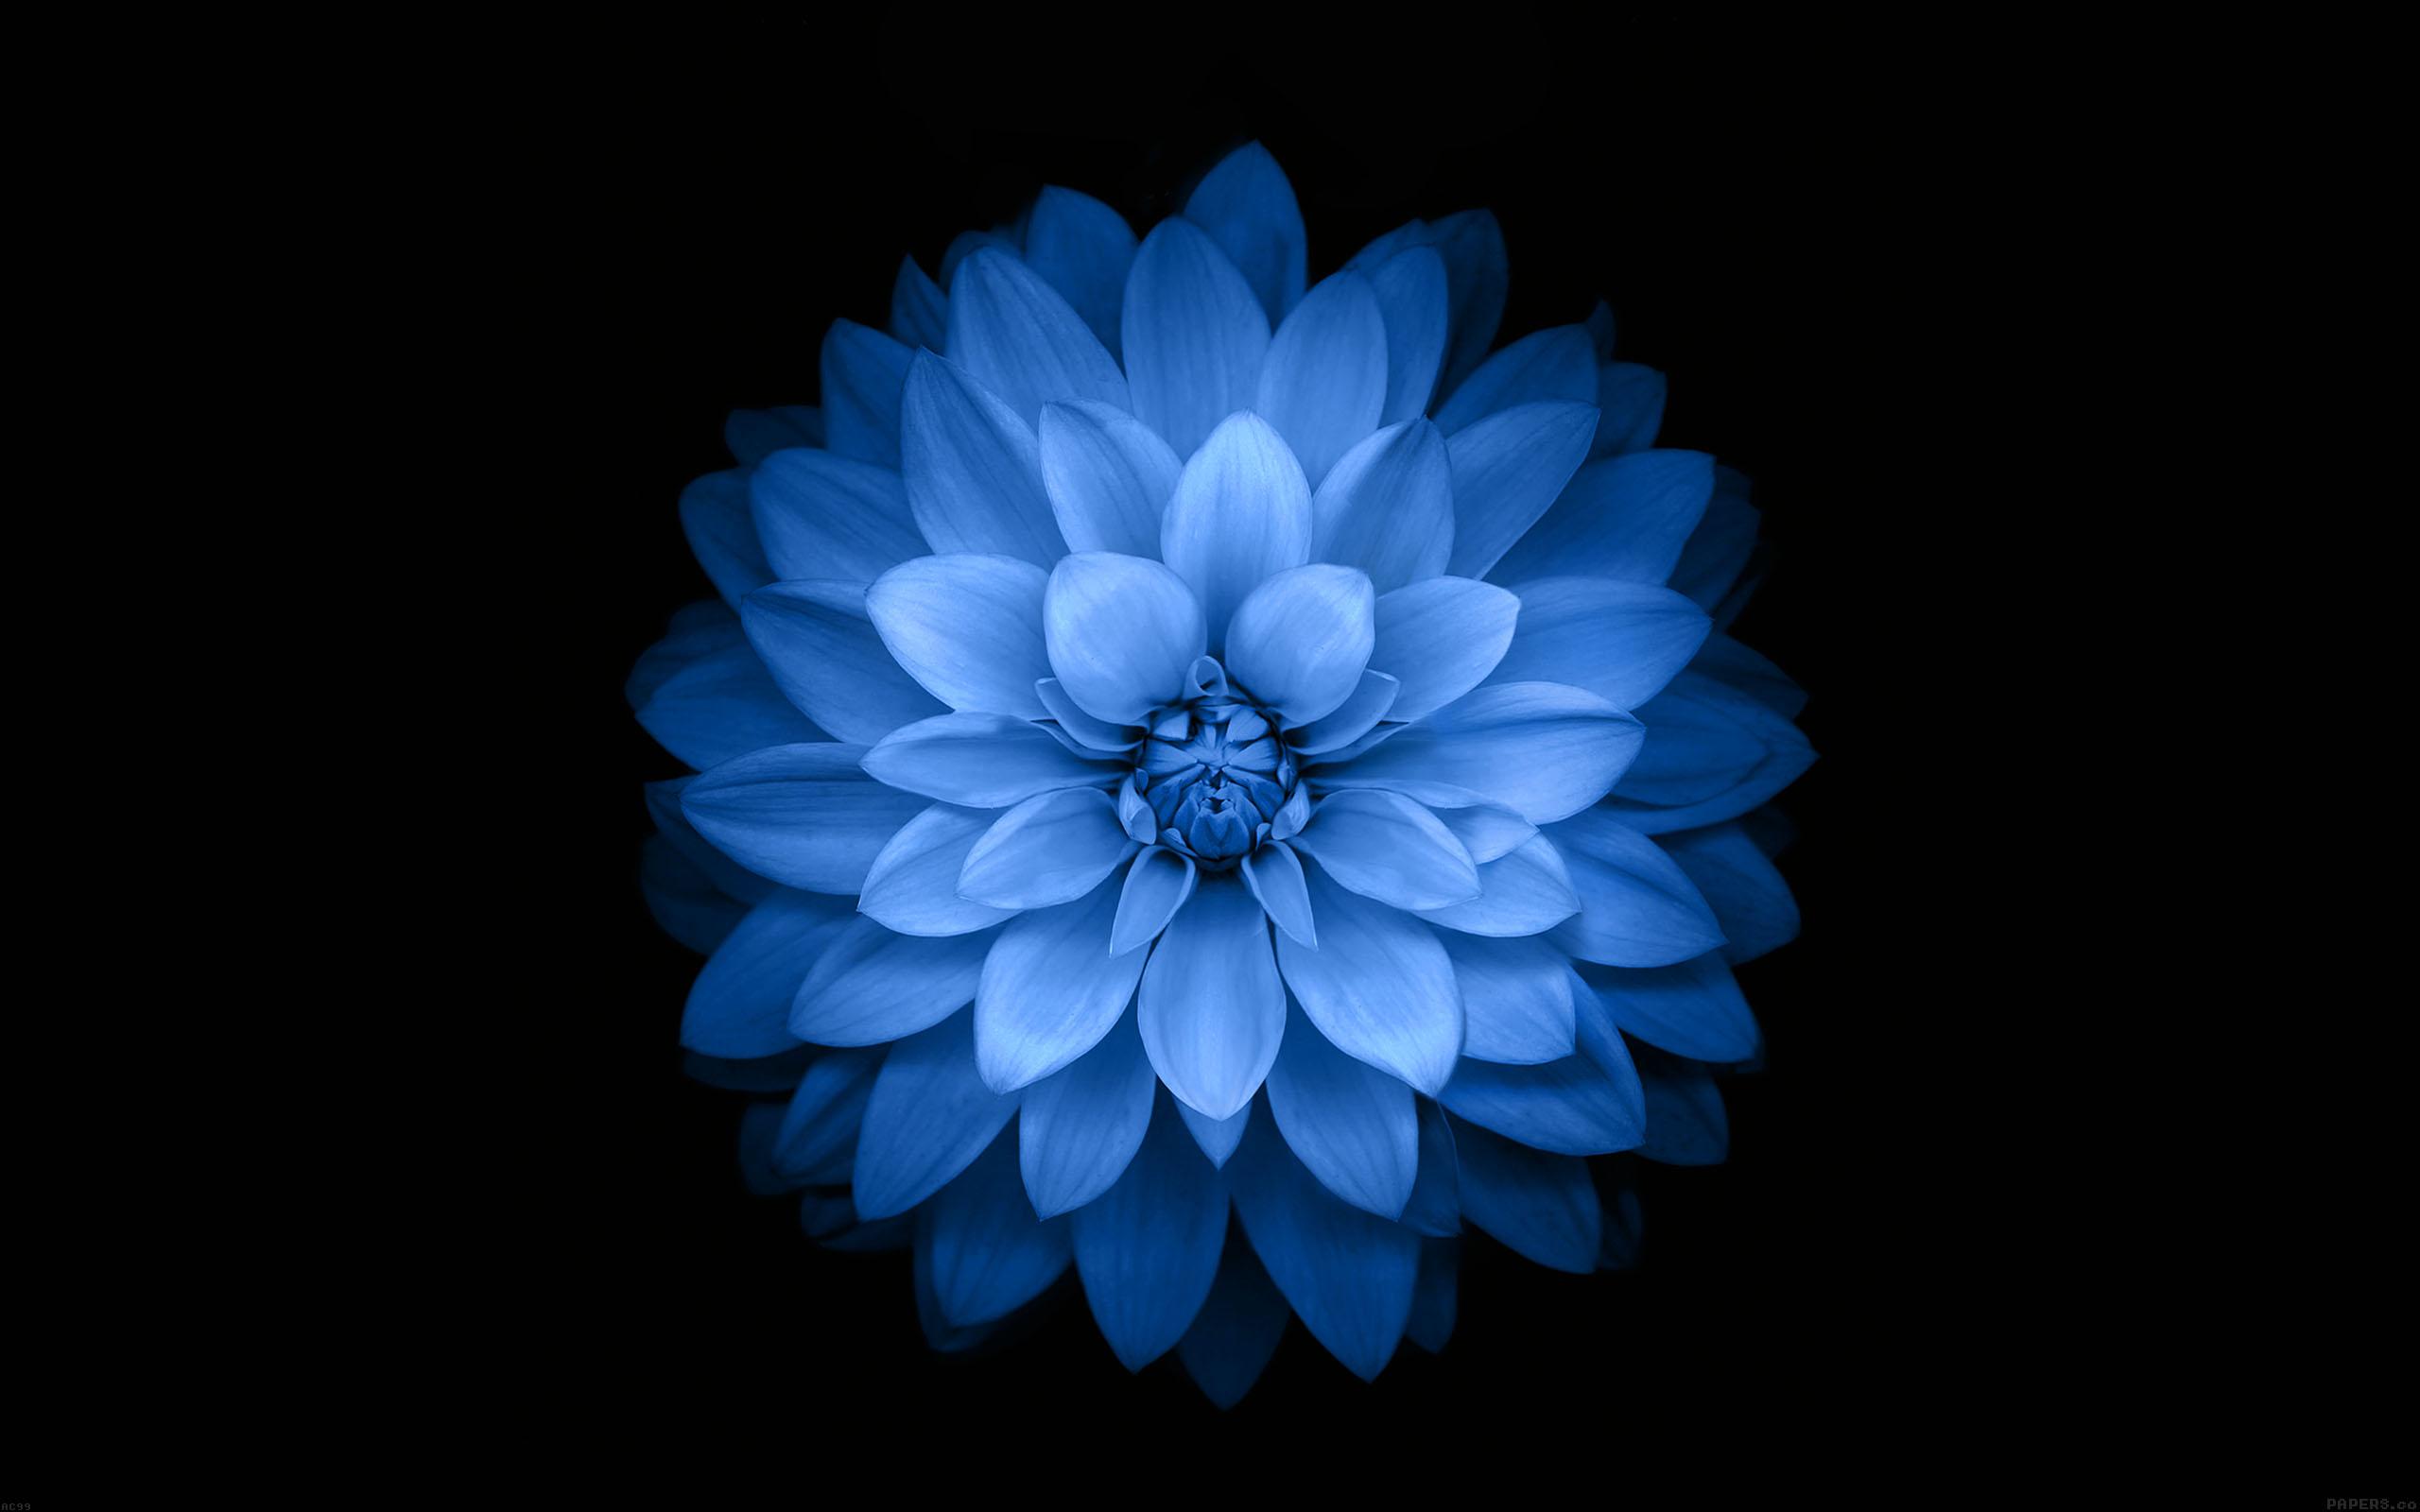 Car Wallpapers Iphone 6 Plus Ac99 Wallpaper Apple Blue Lotus Iphone6 Plus Ios8 Flower